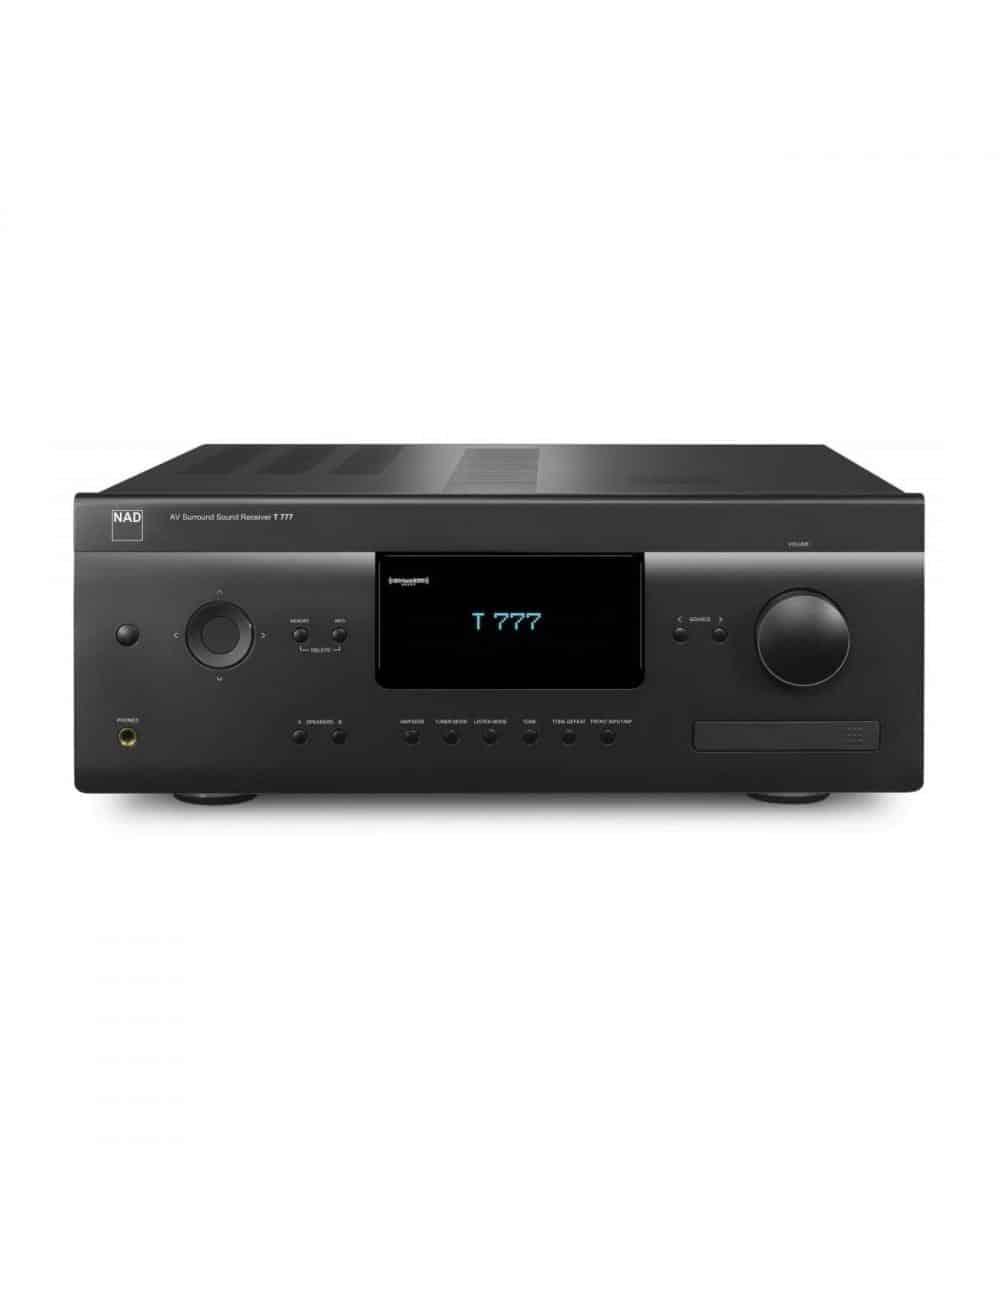 sintoamplificatore audio video multicanale, NAD T 777 v3, vista frontale